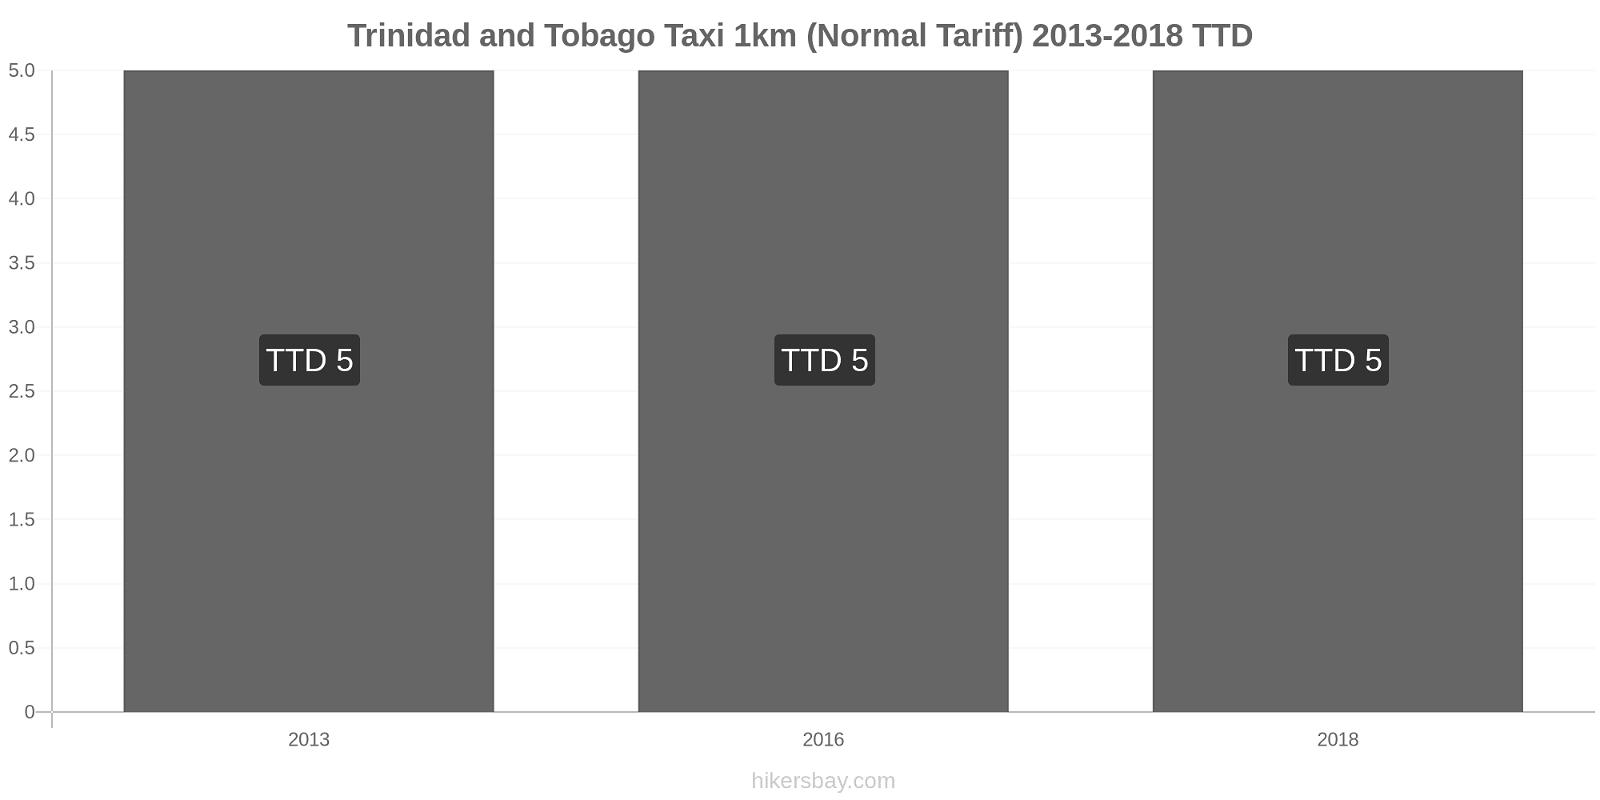 Trinidad and Tobago price changes Taxi 1km (Normal Tariff) hikersbay.com